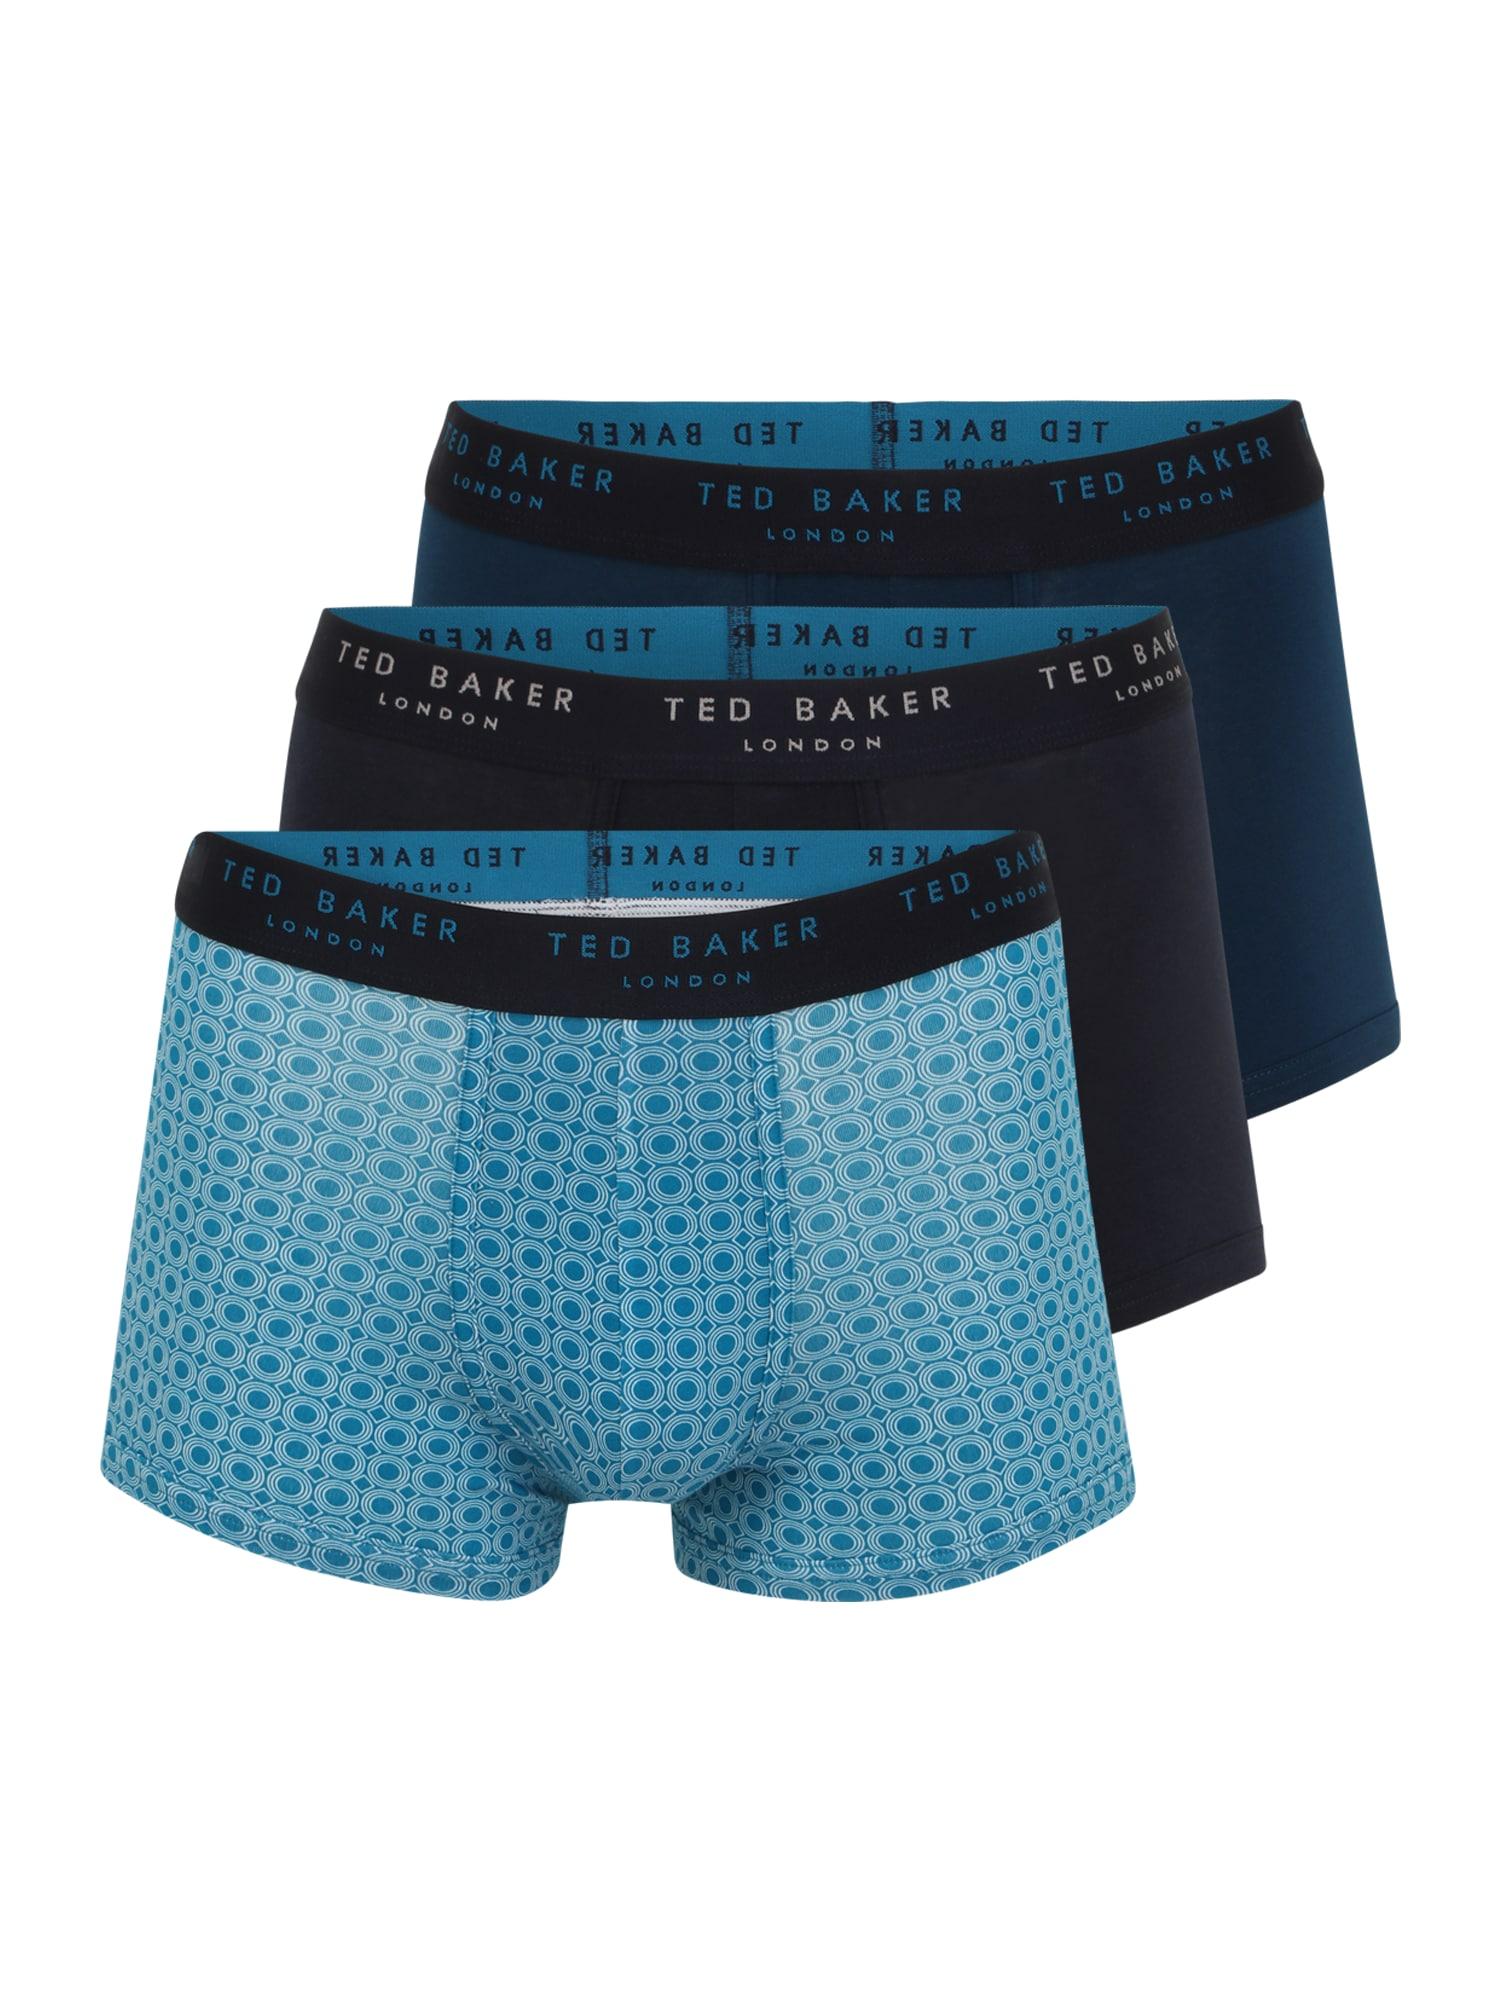 Ted Baker Boxer trumpikės mėlyna / juoda / tamsiai mėlyna